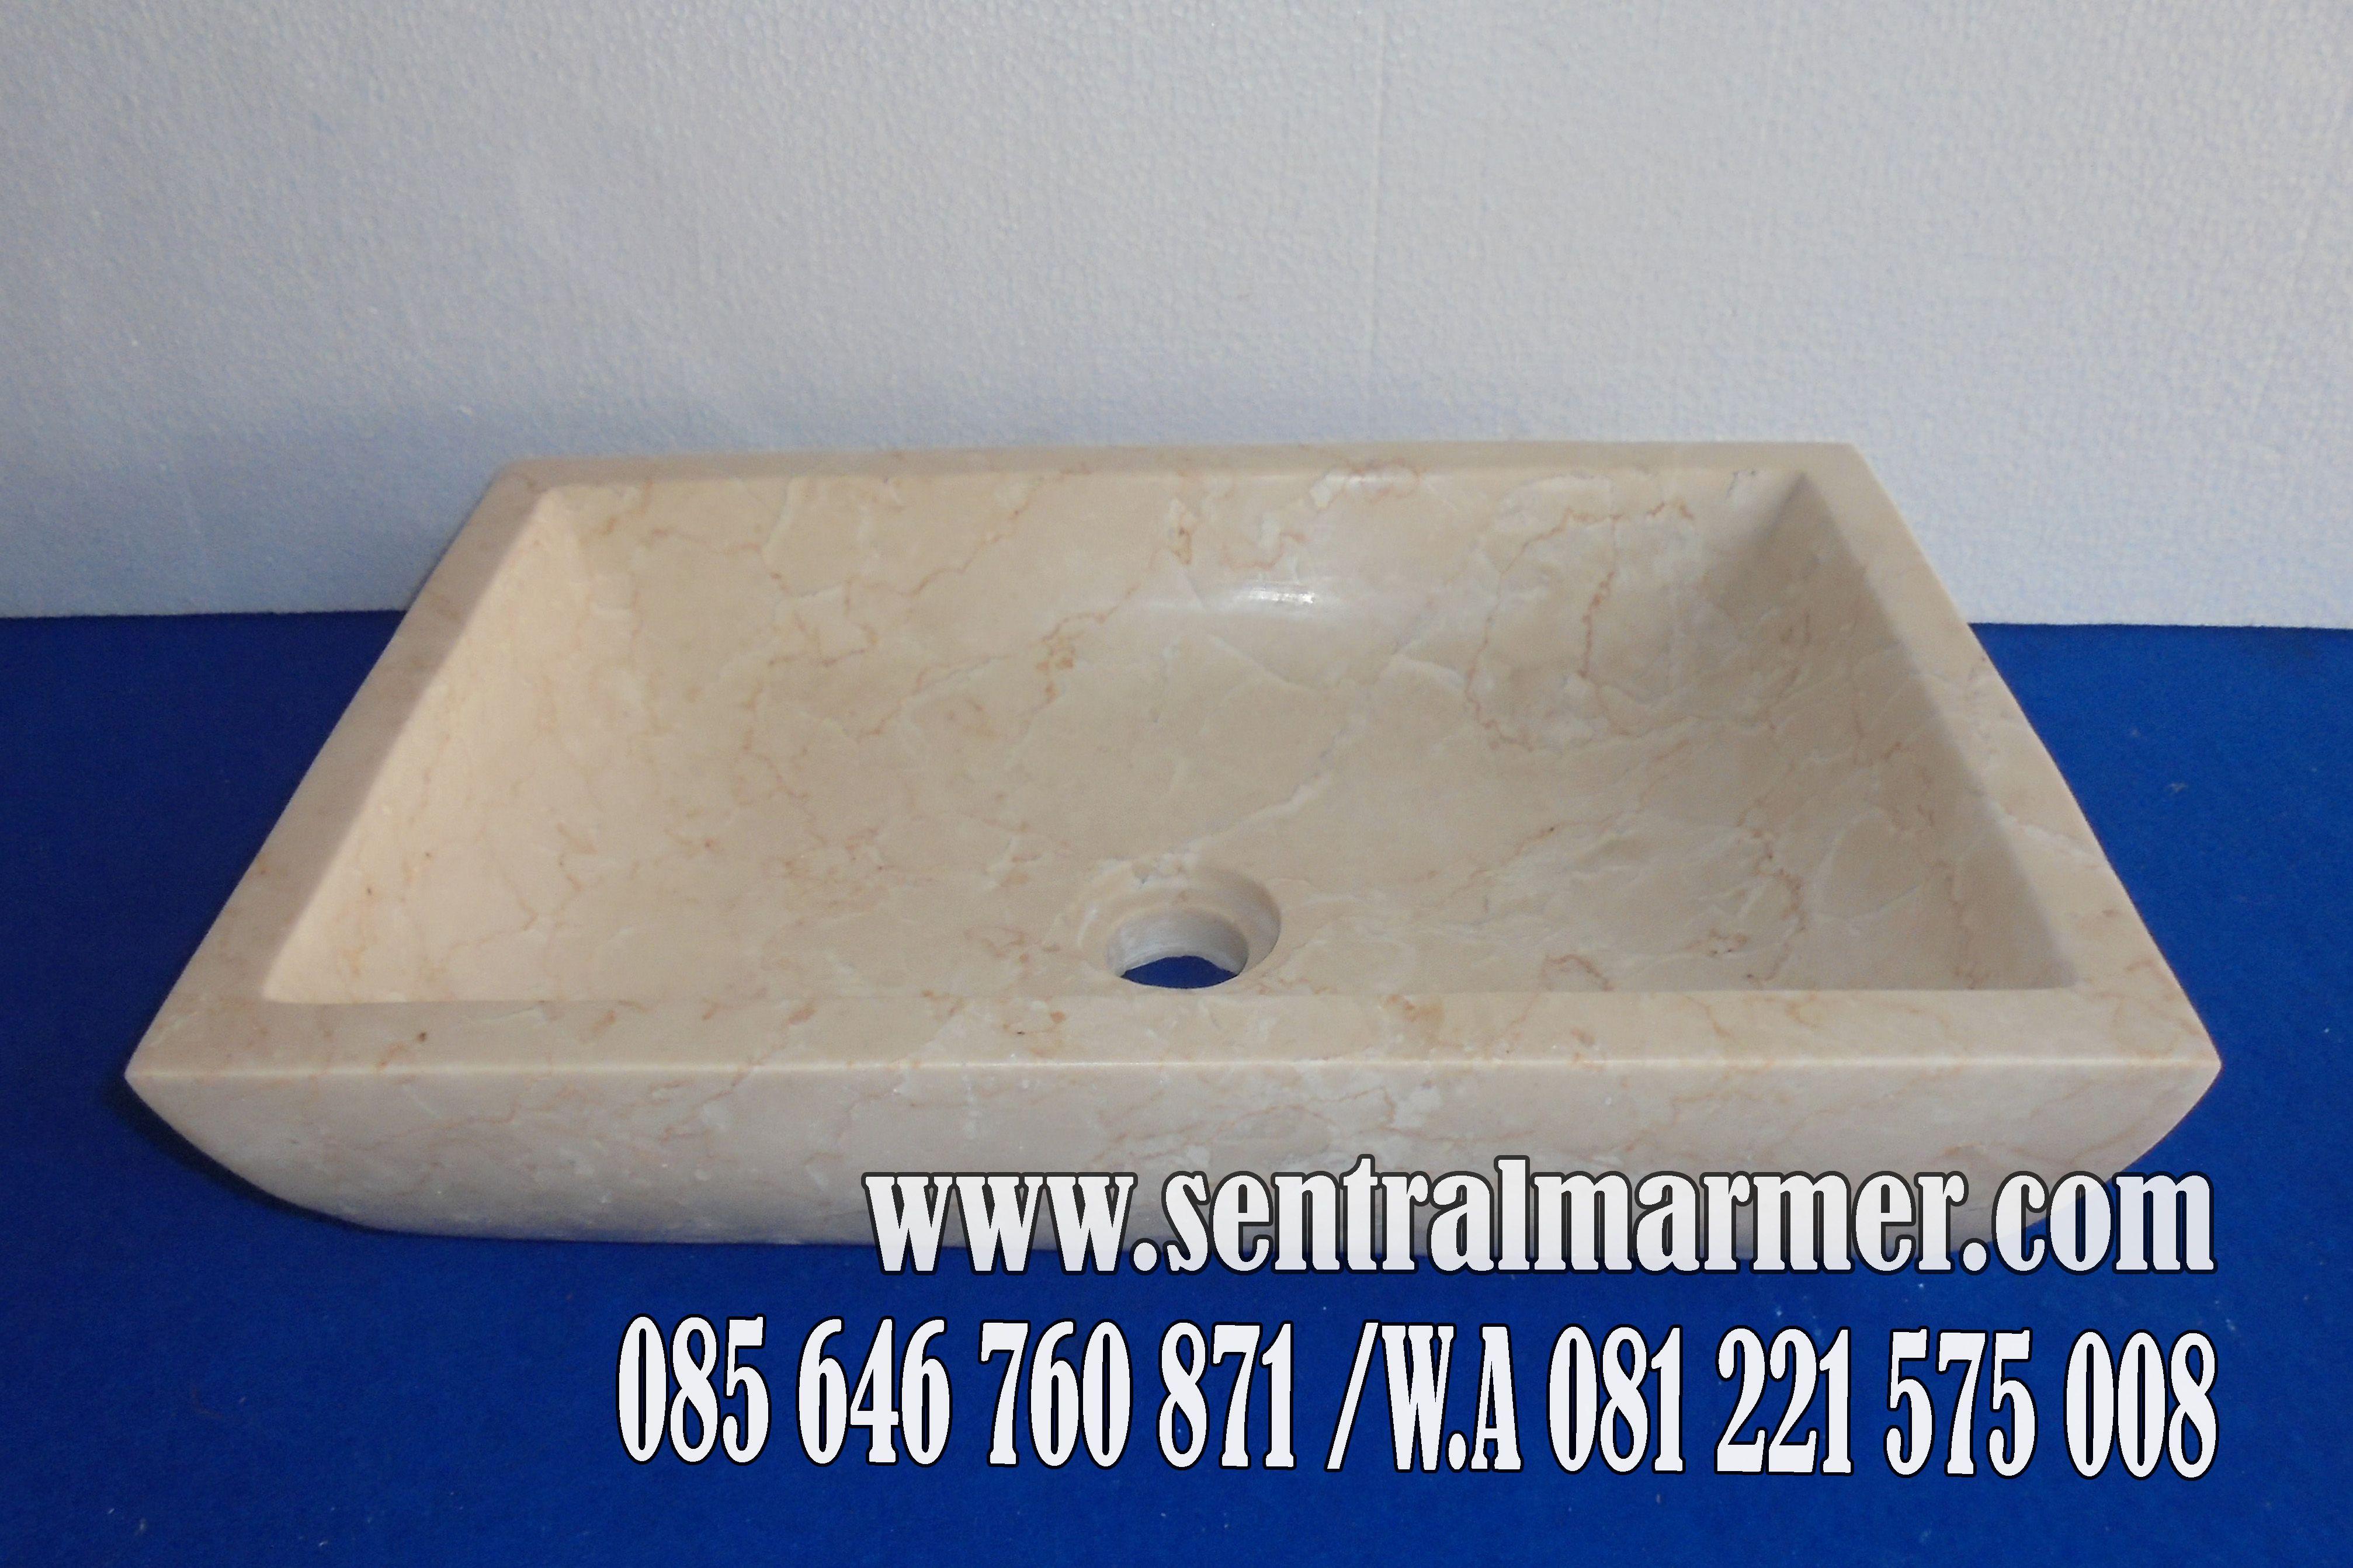 Jual Wastafel Marmer Kotak